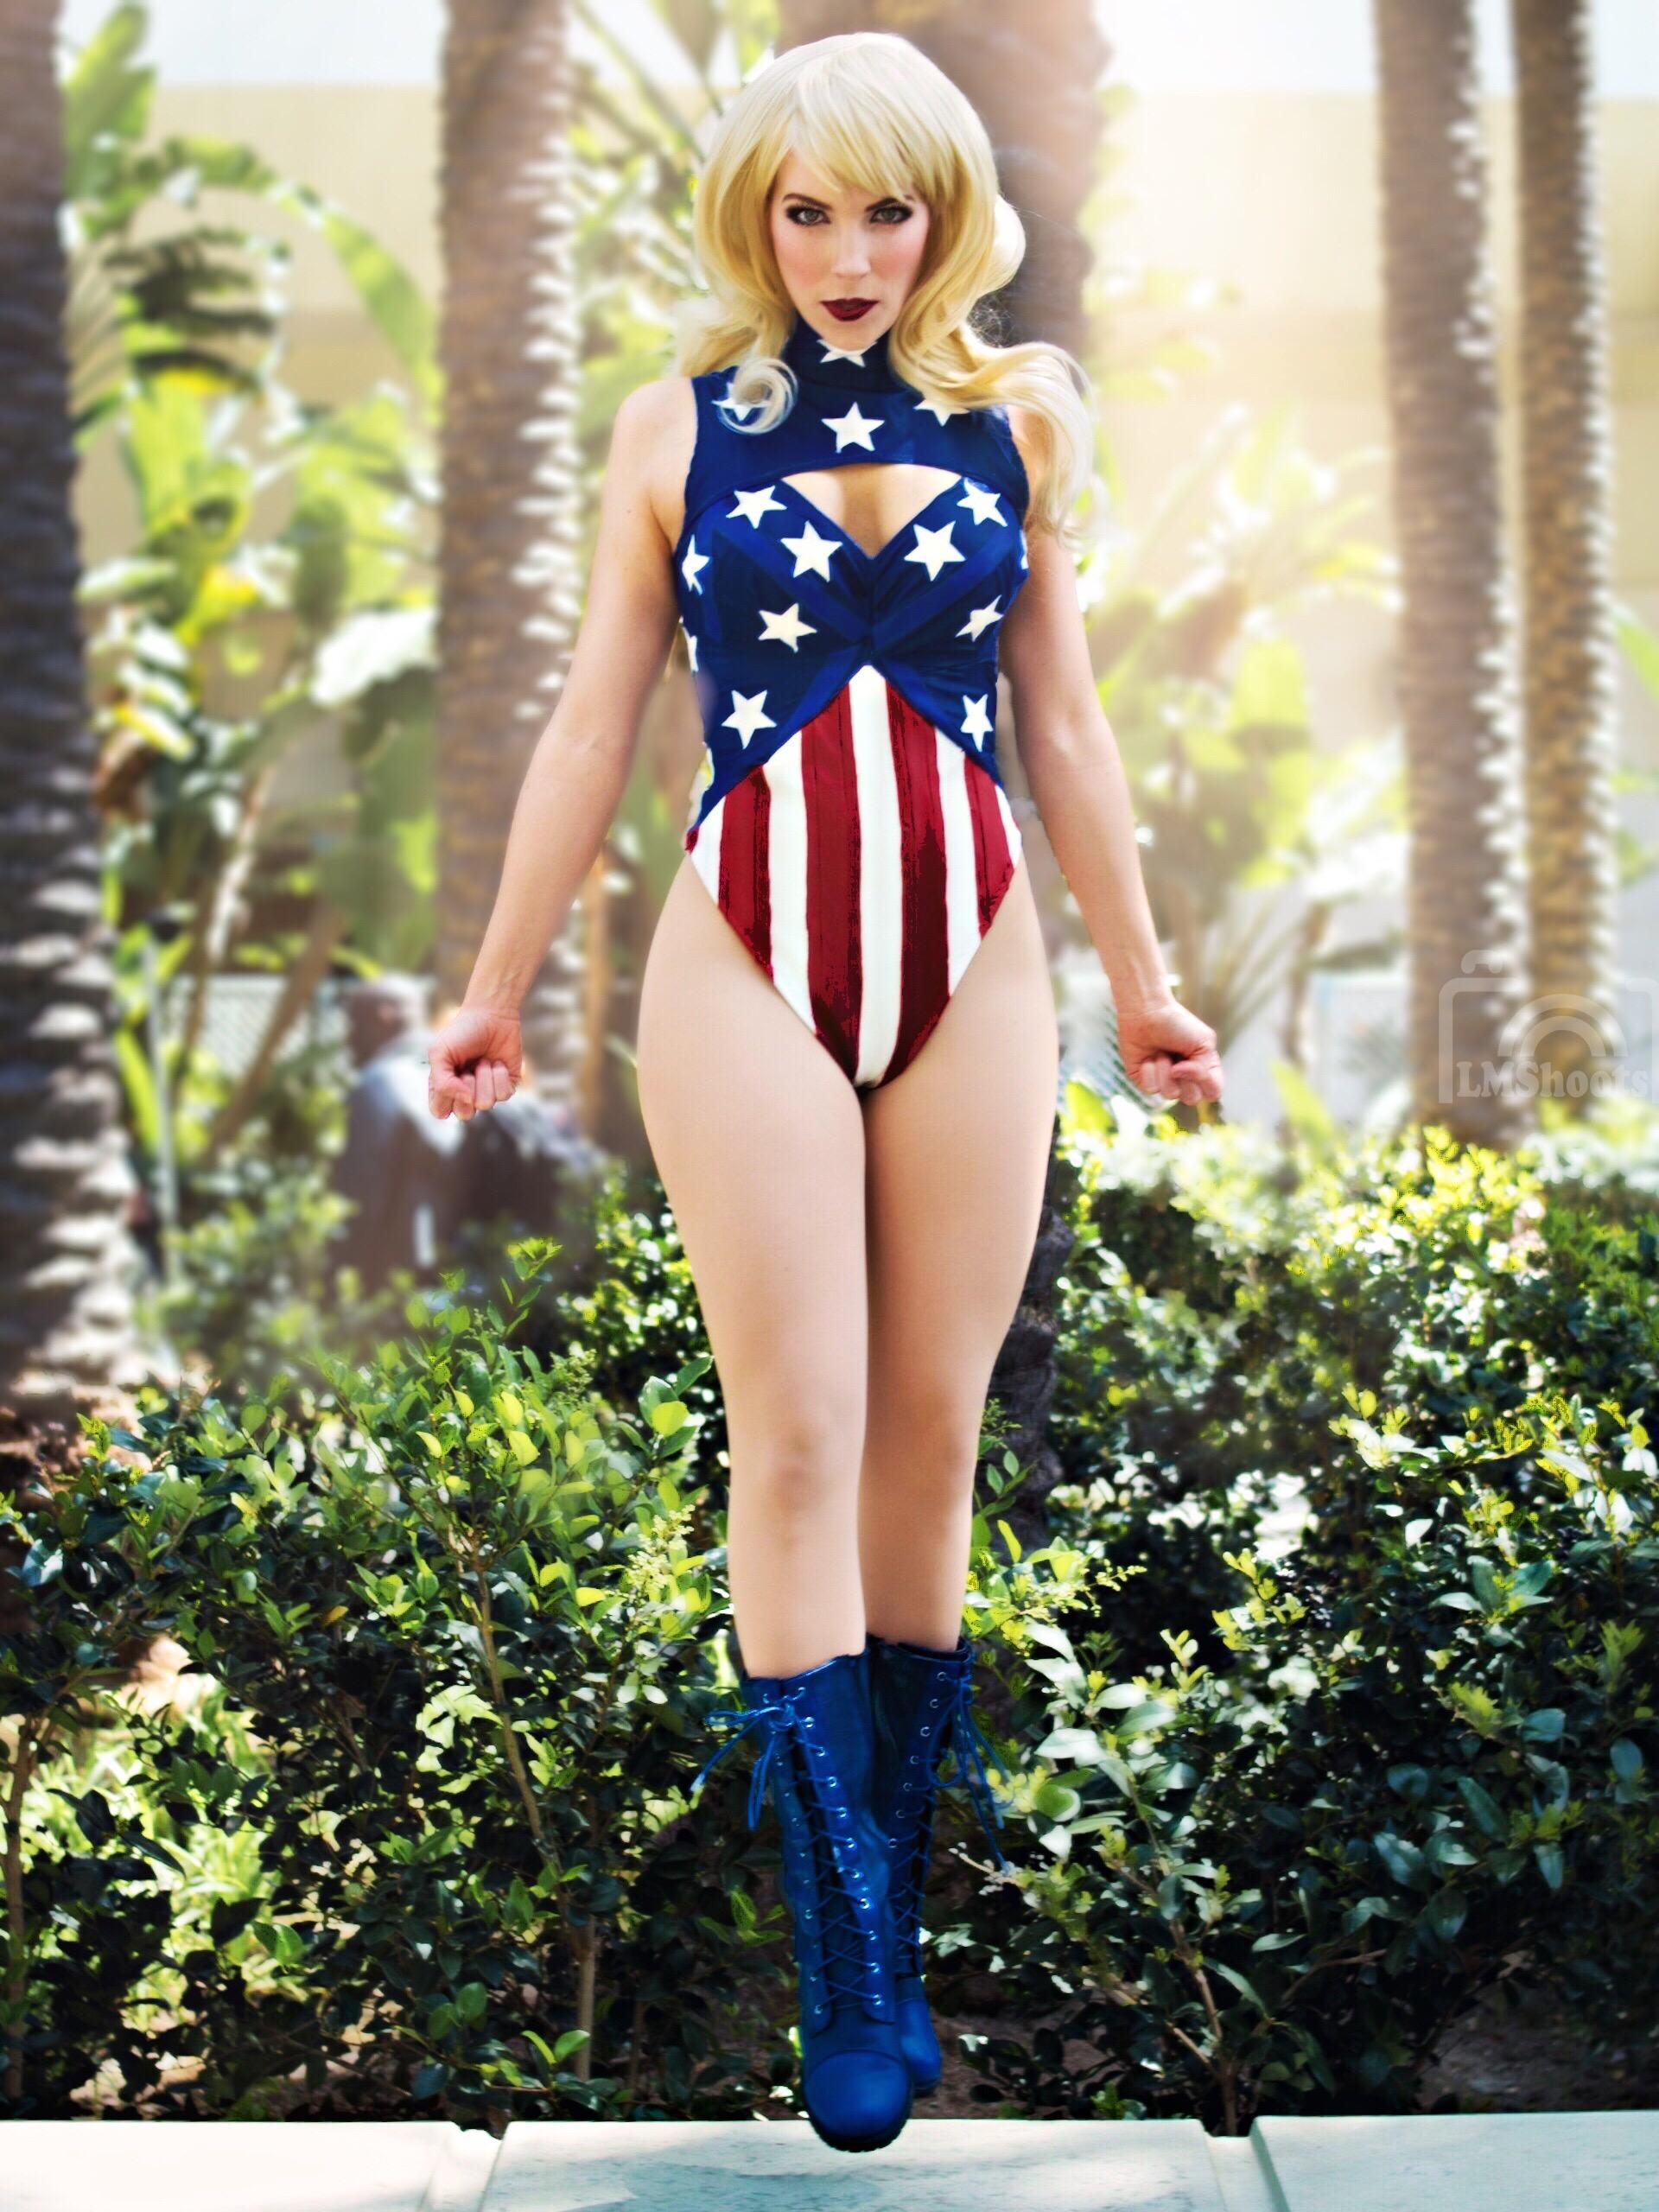 Lady America